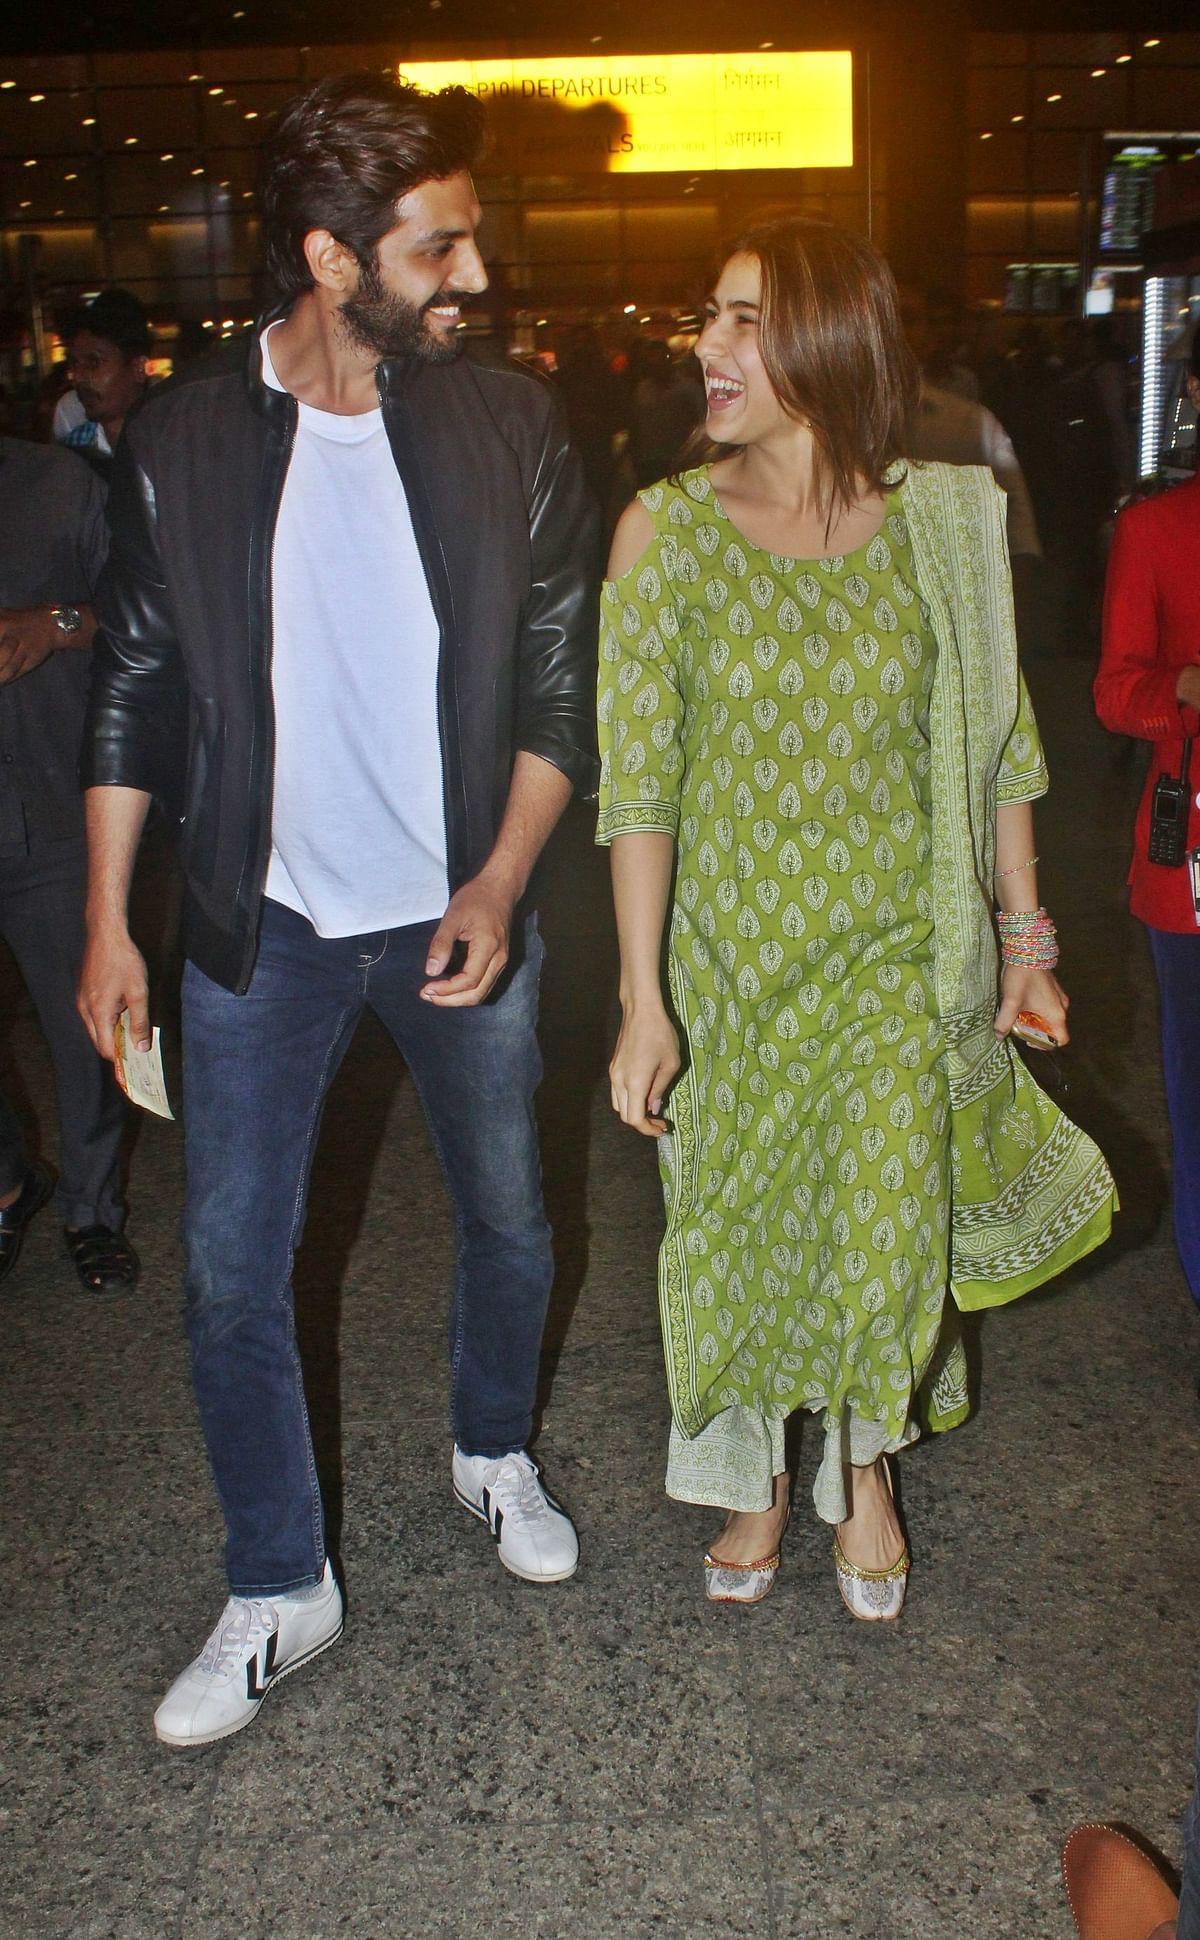 Rumoured couple Sara Ali Khan and Kartik Aaryan were caught by the lens of paparazzi.